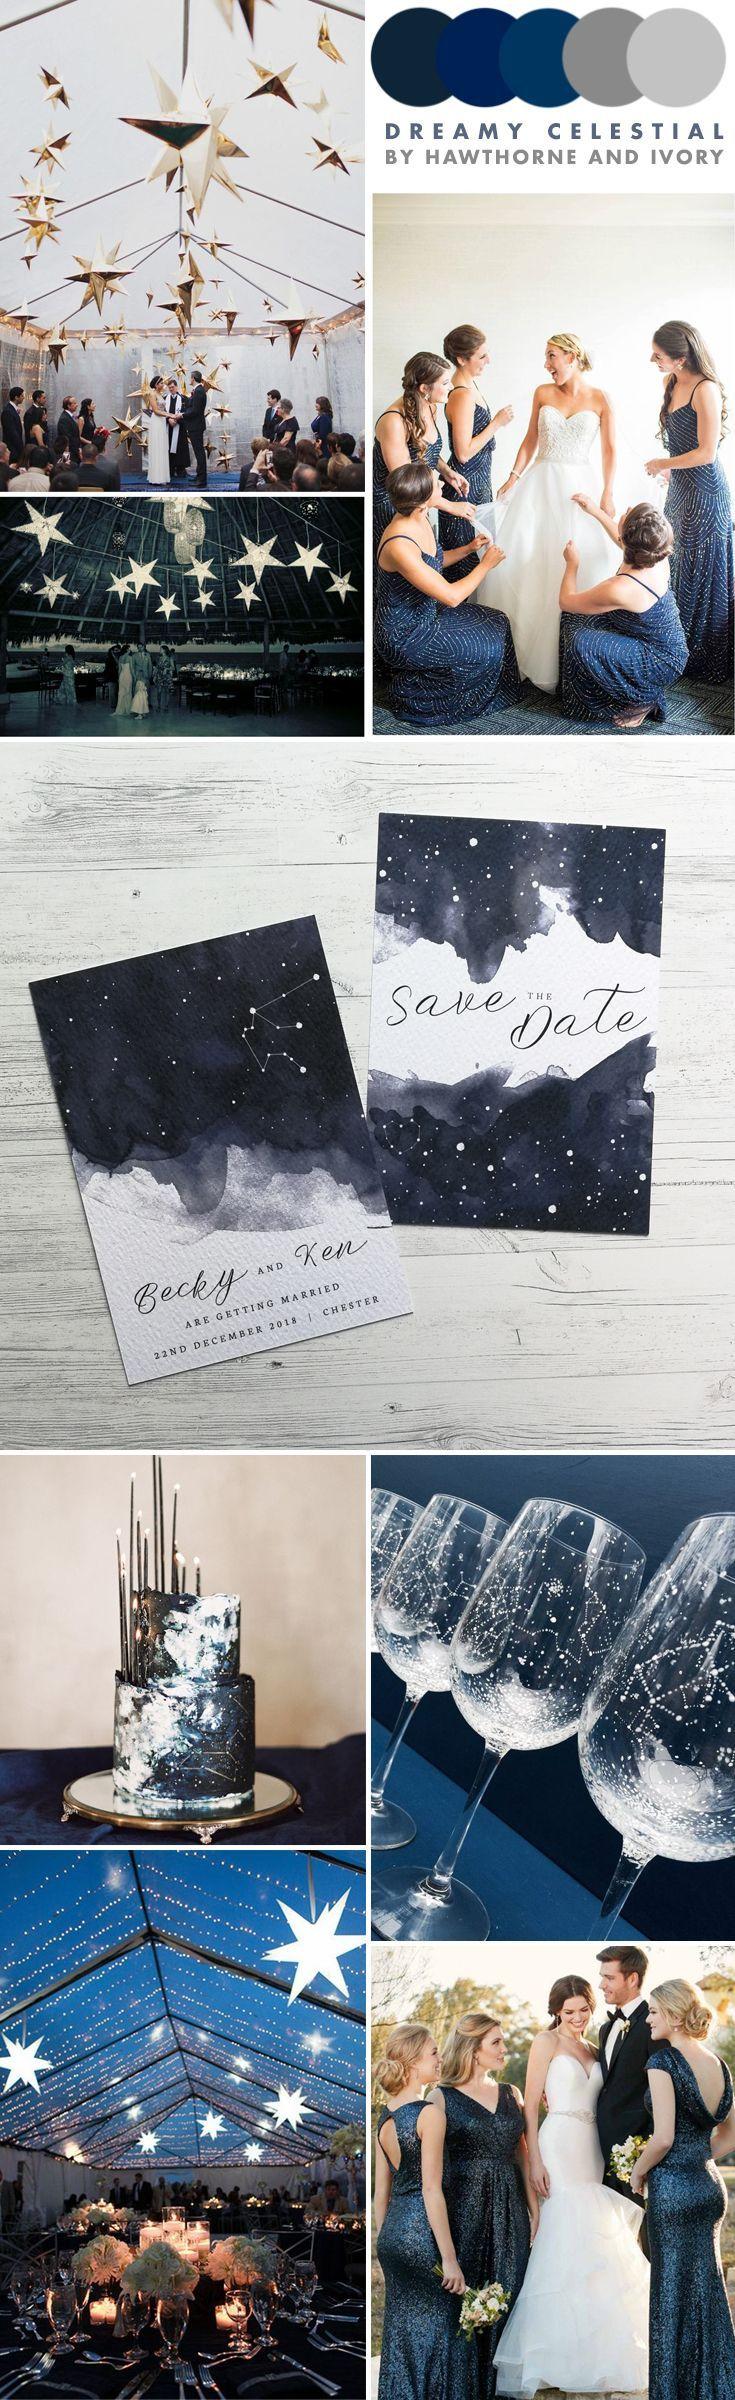 Wedding decorations and ideas december 2018 Celestial Star Themed Wedding Inspiration Moodboard  Celestial